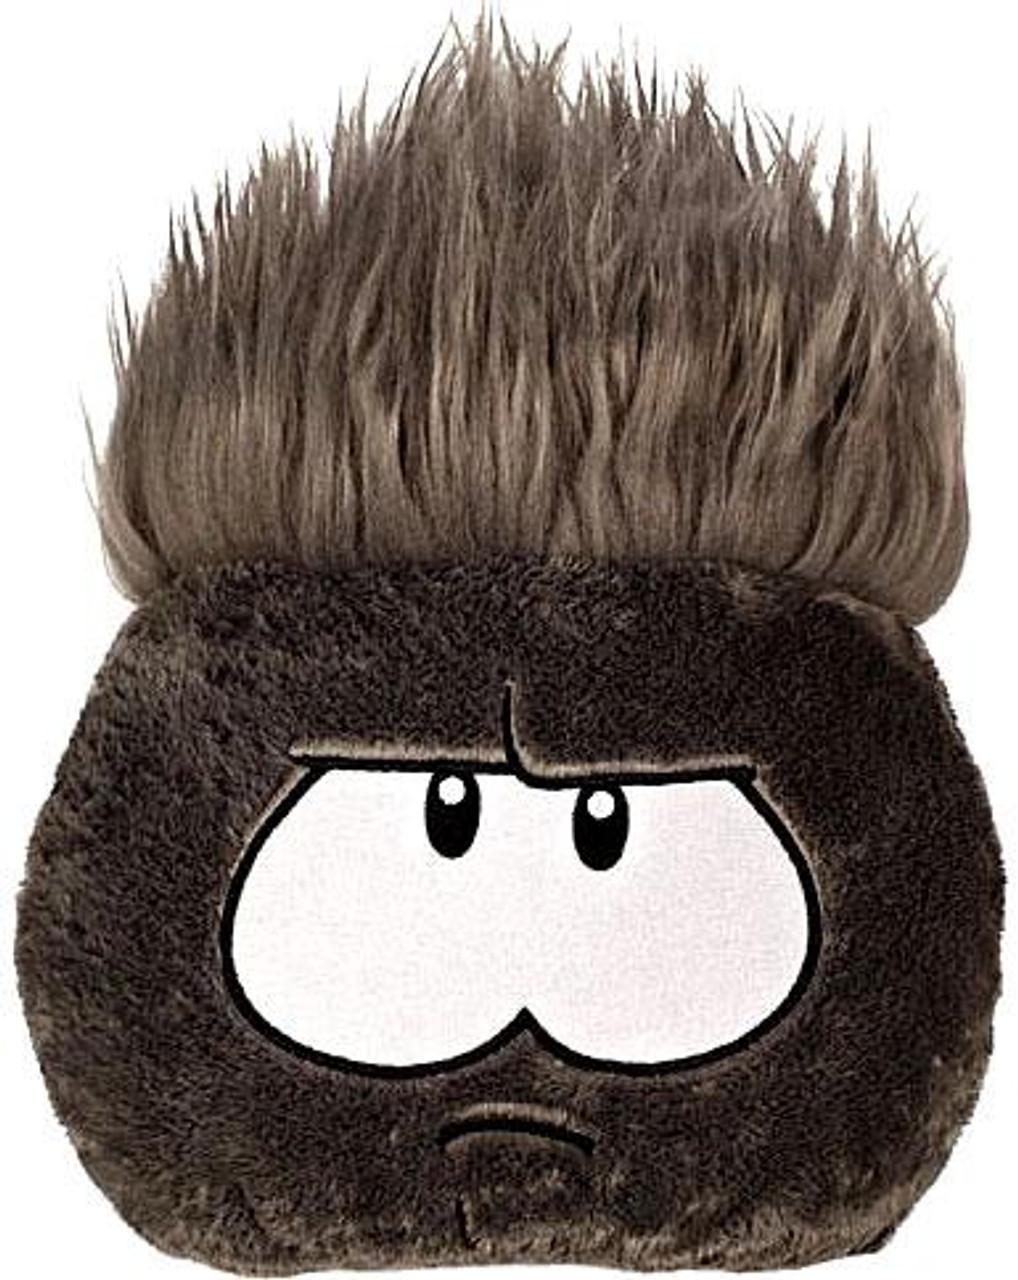 Club Penguin Black Puffle 8-Inch Plush